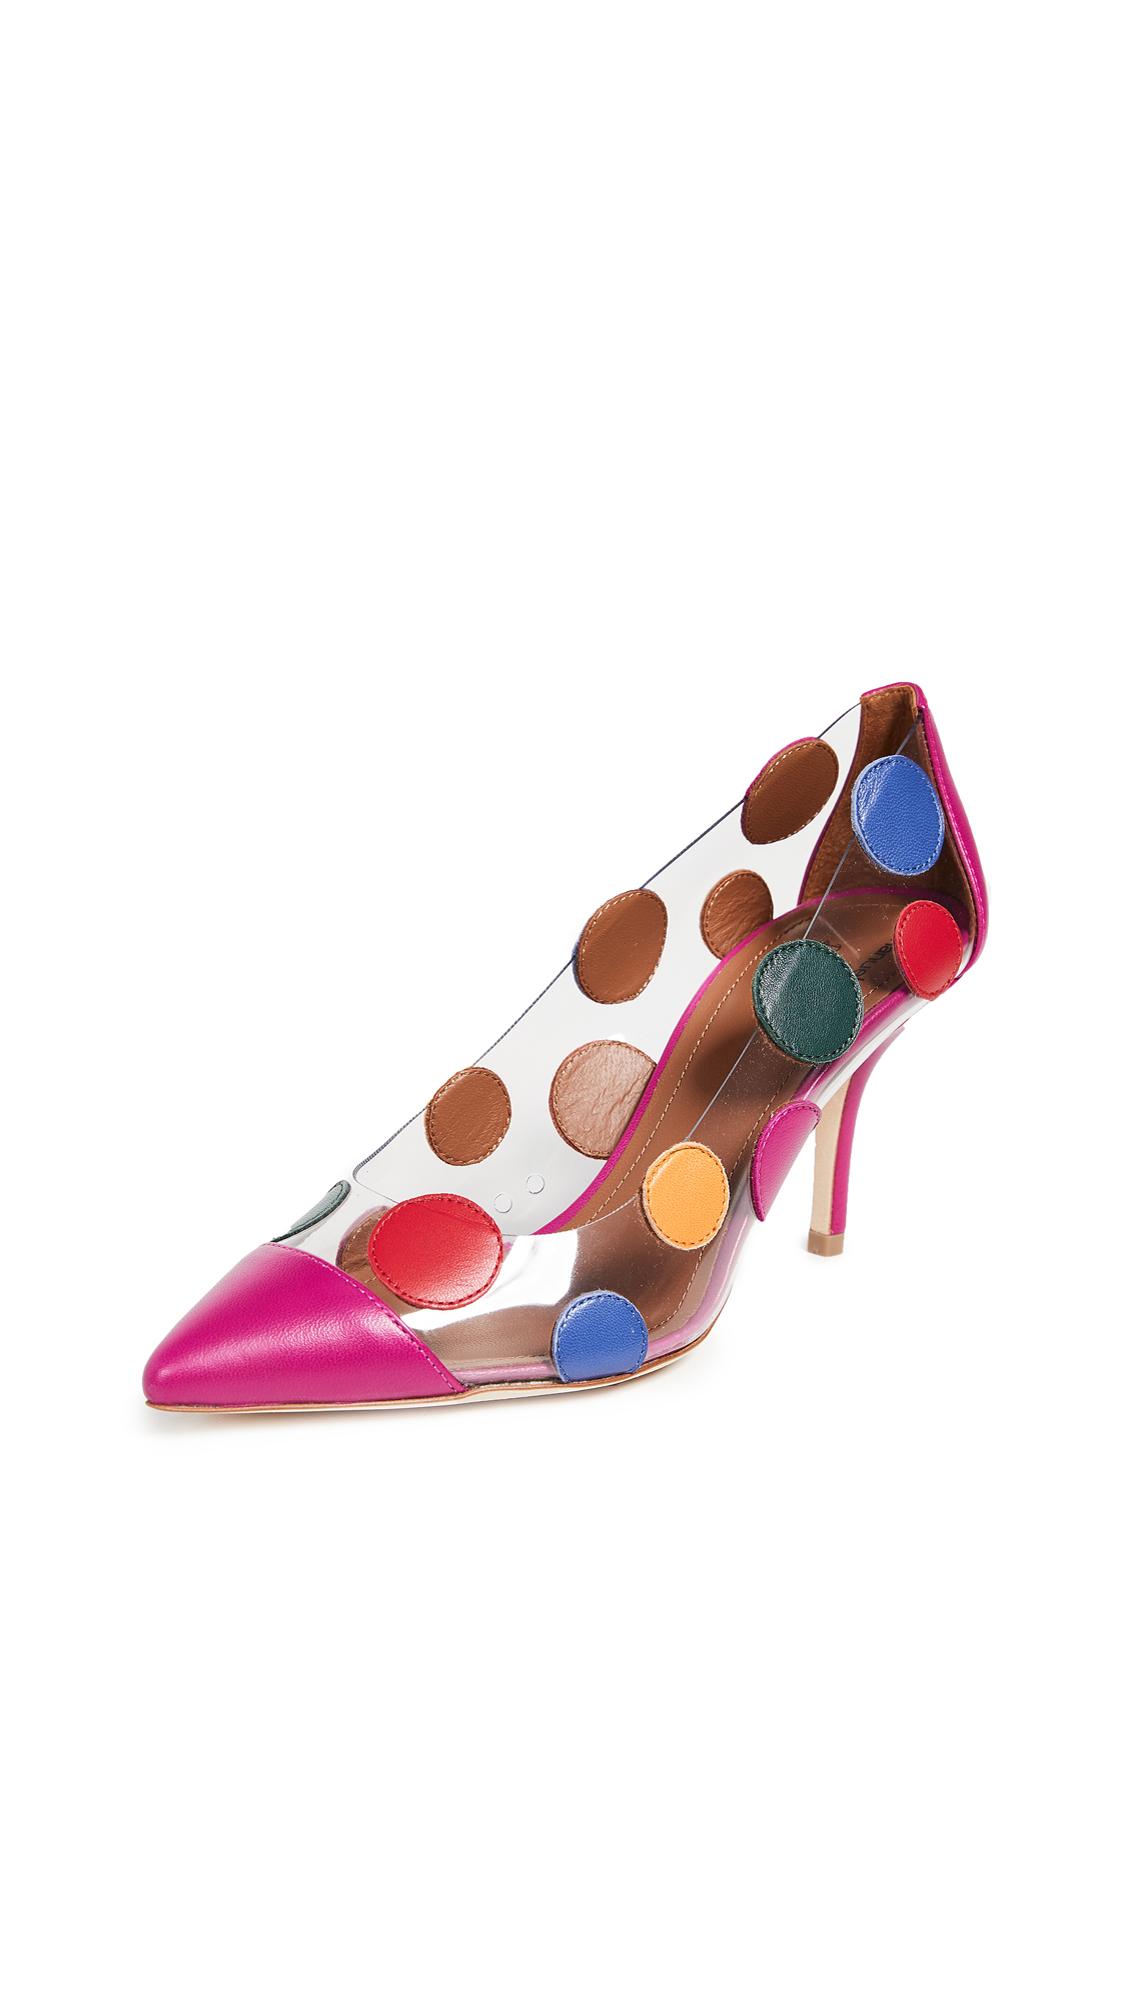 Malone Souliers Christie Ungaro Pumps - Pink/Multi